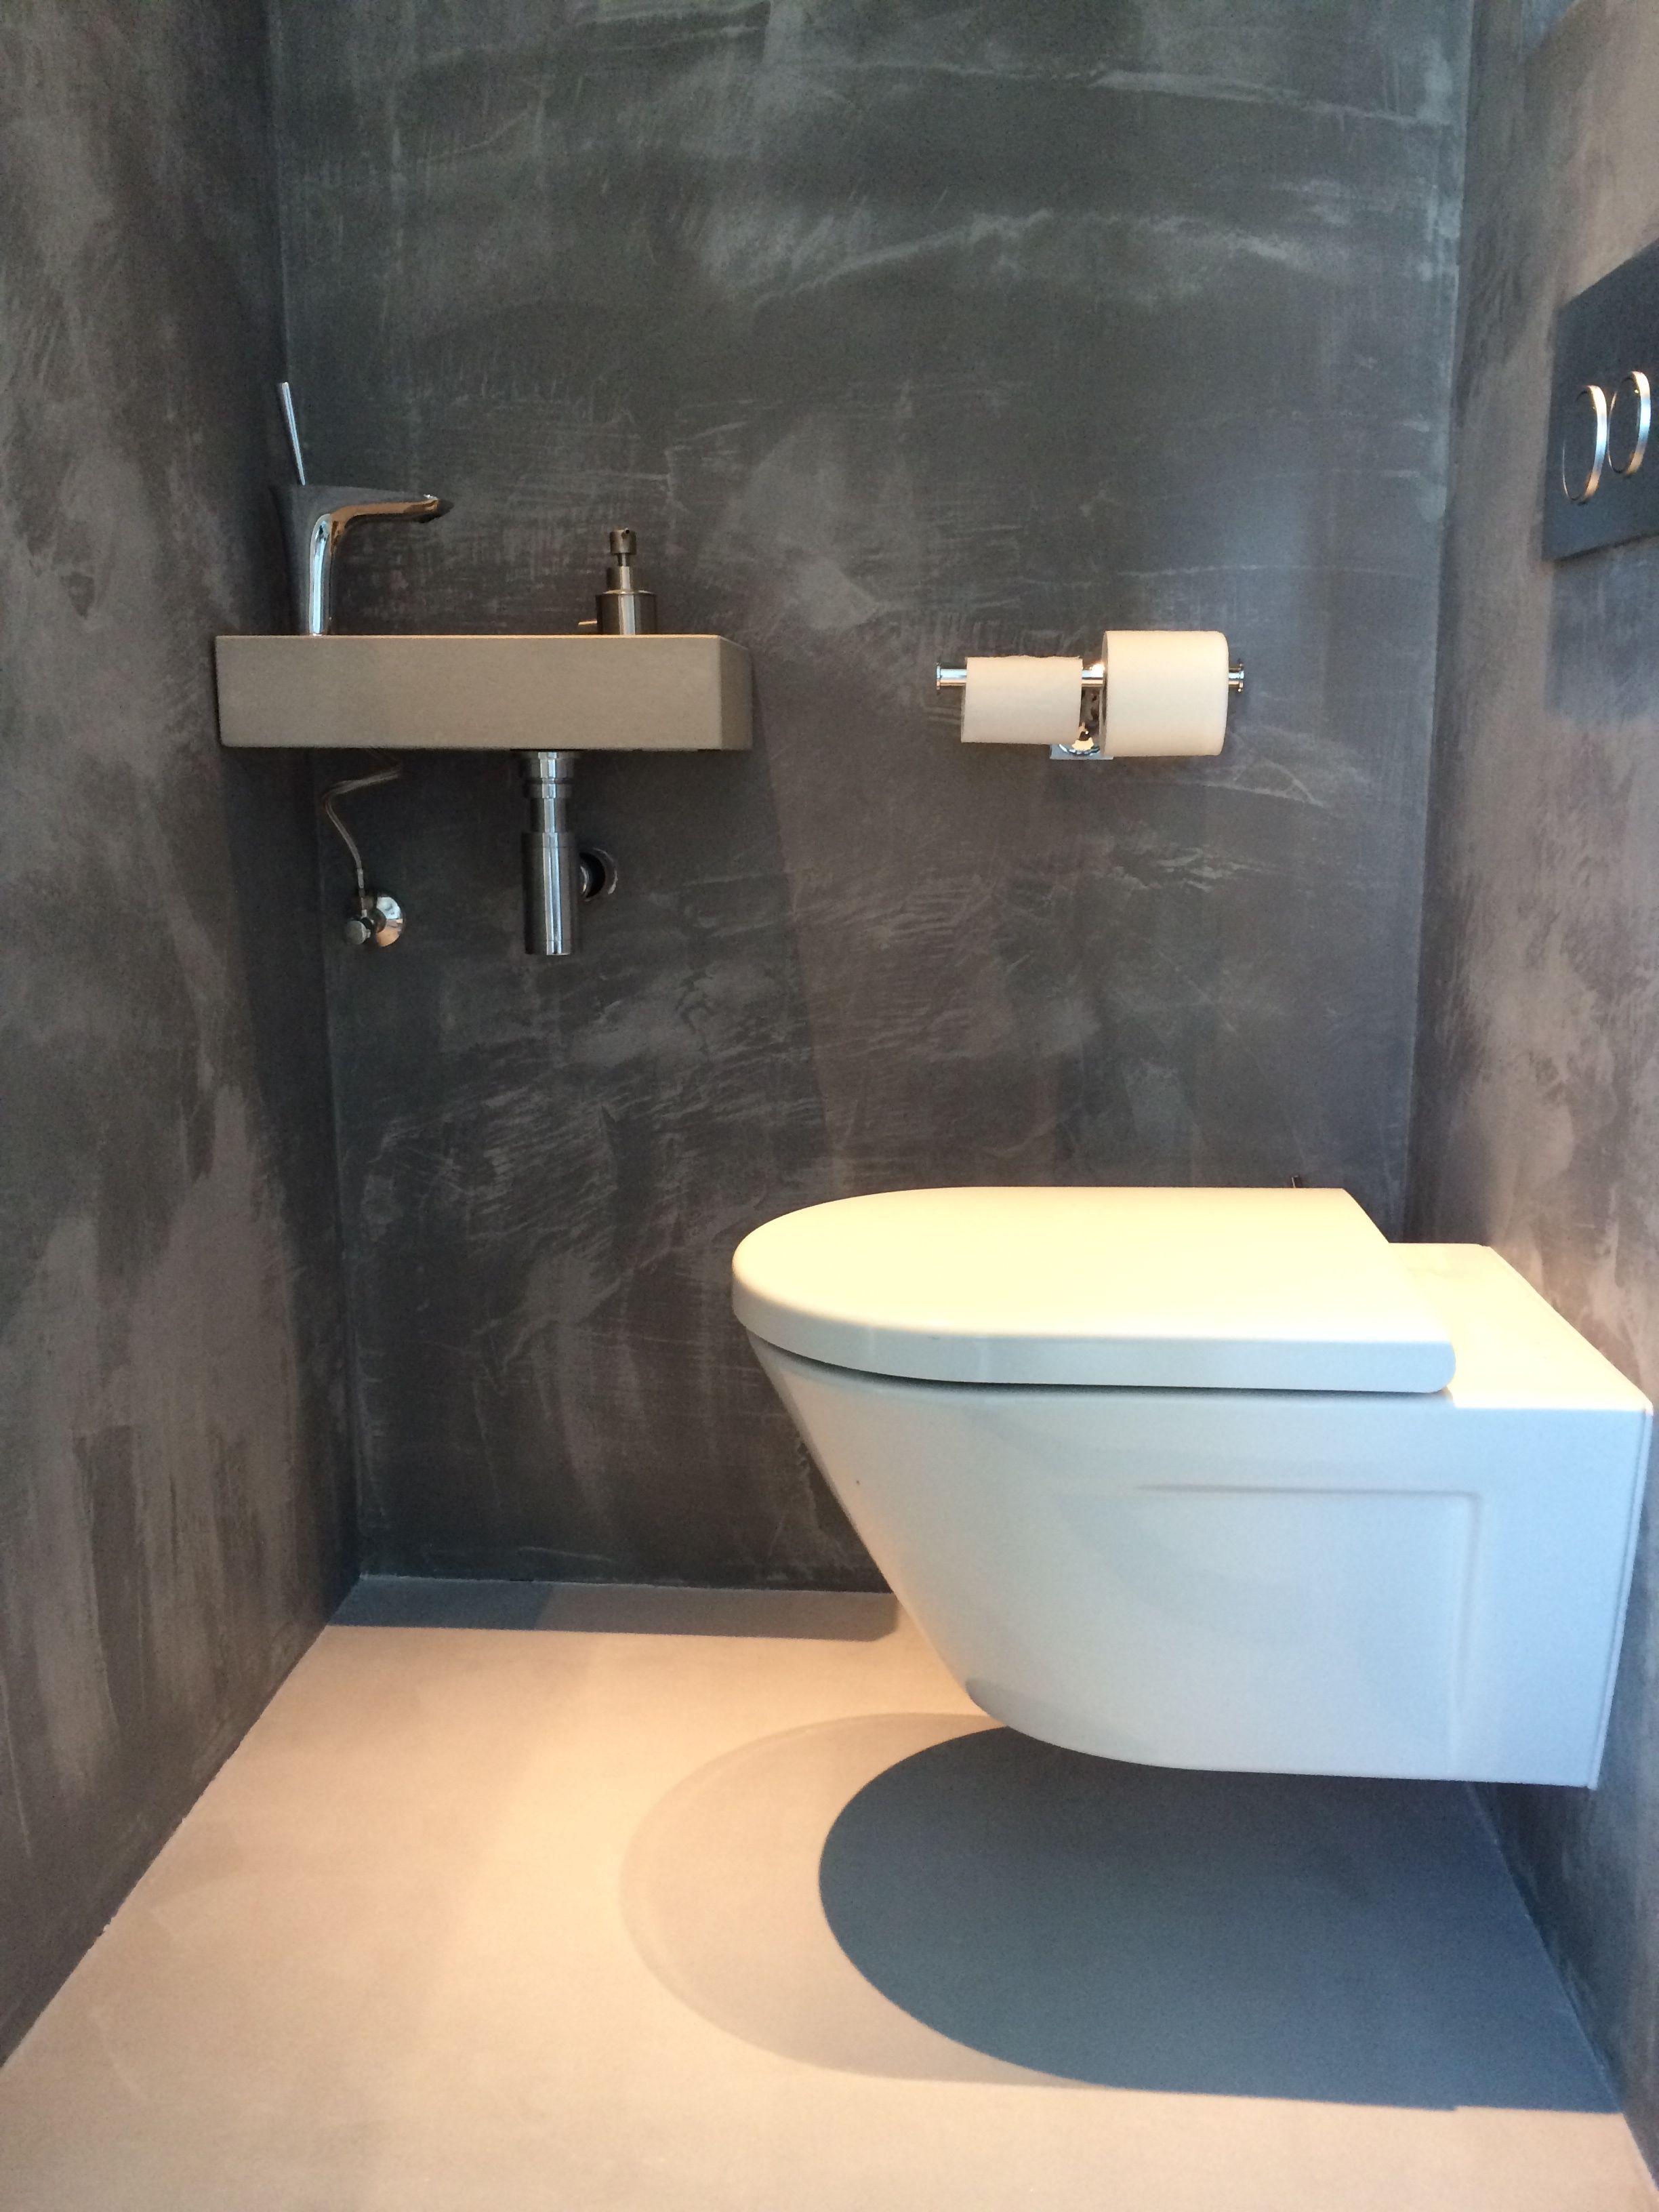 Magnifiek Beton Cire toilet grijs | B A T H R O O M & s a u n a in 2019 #SJ09